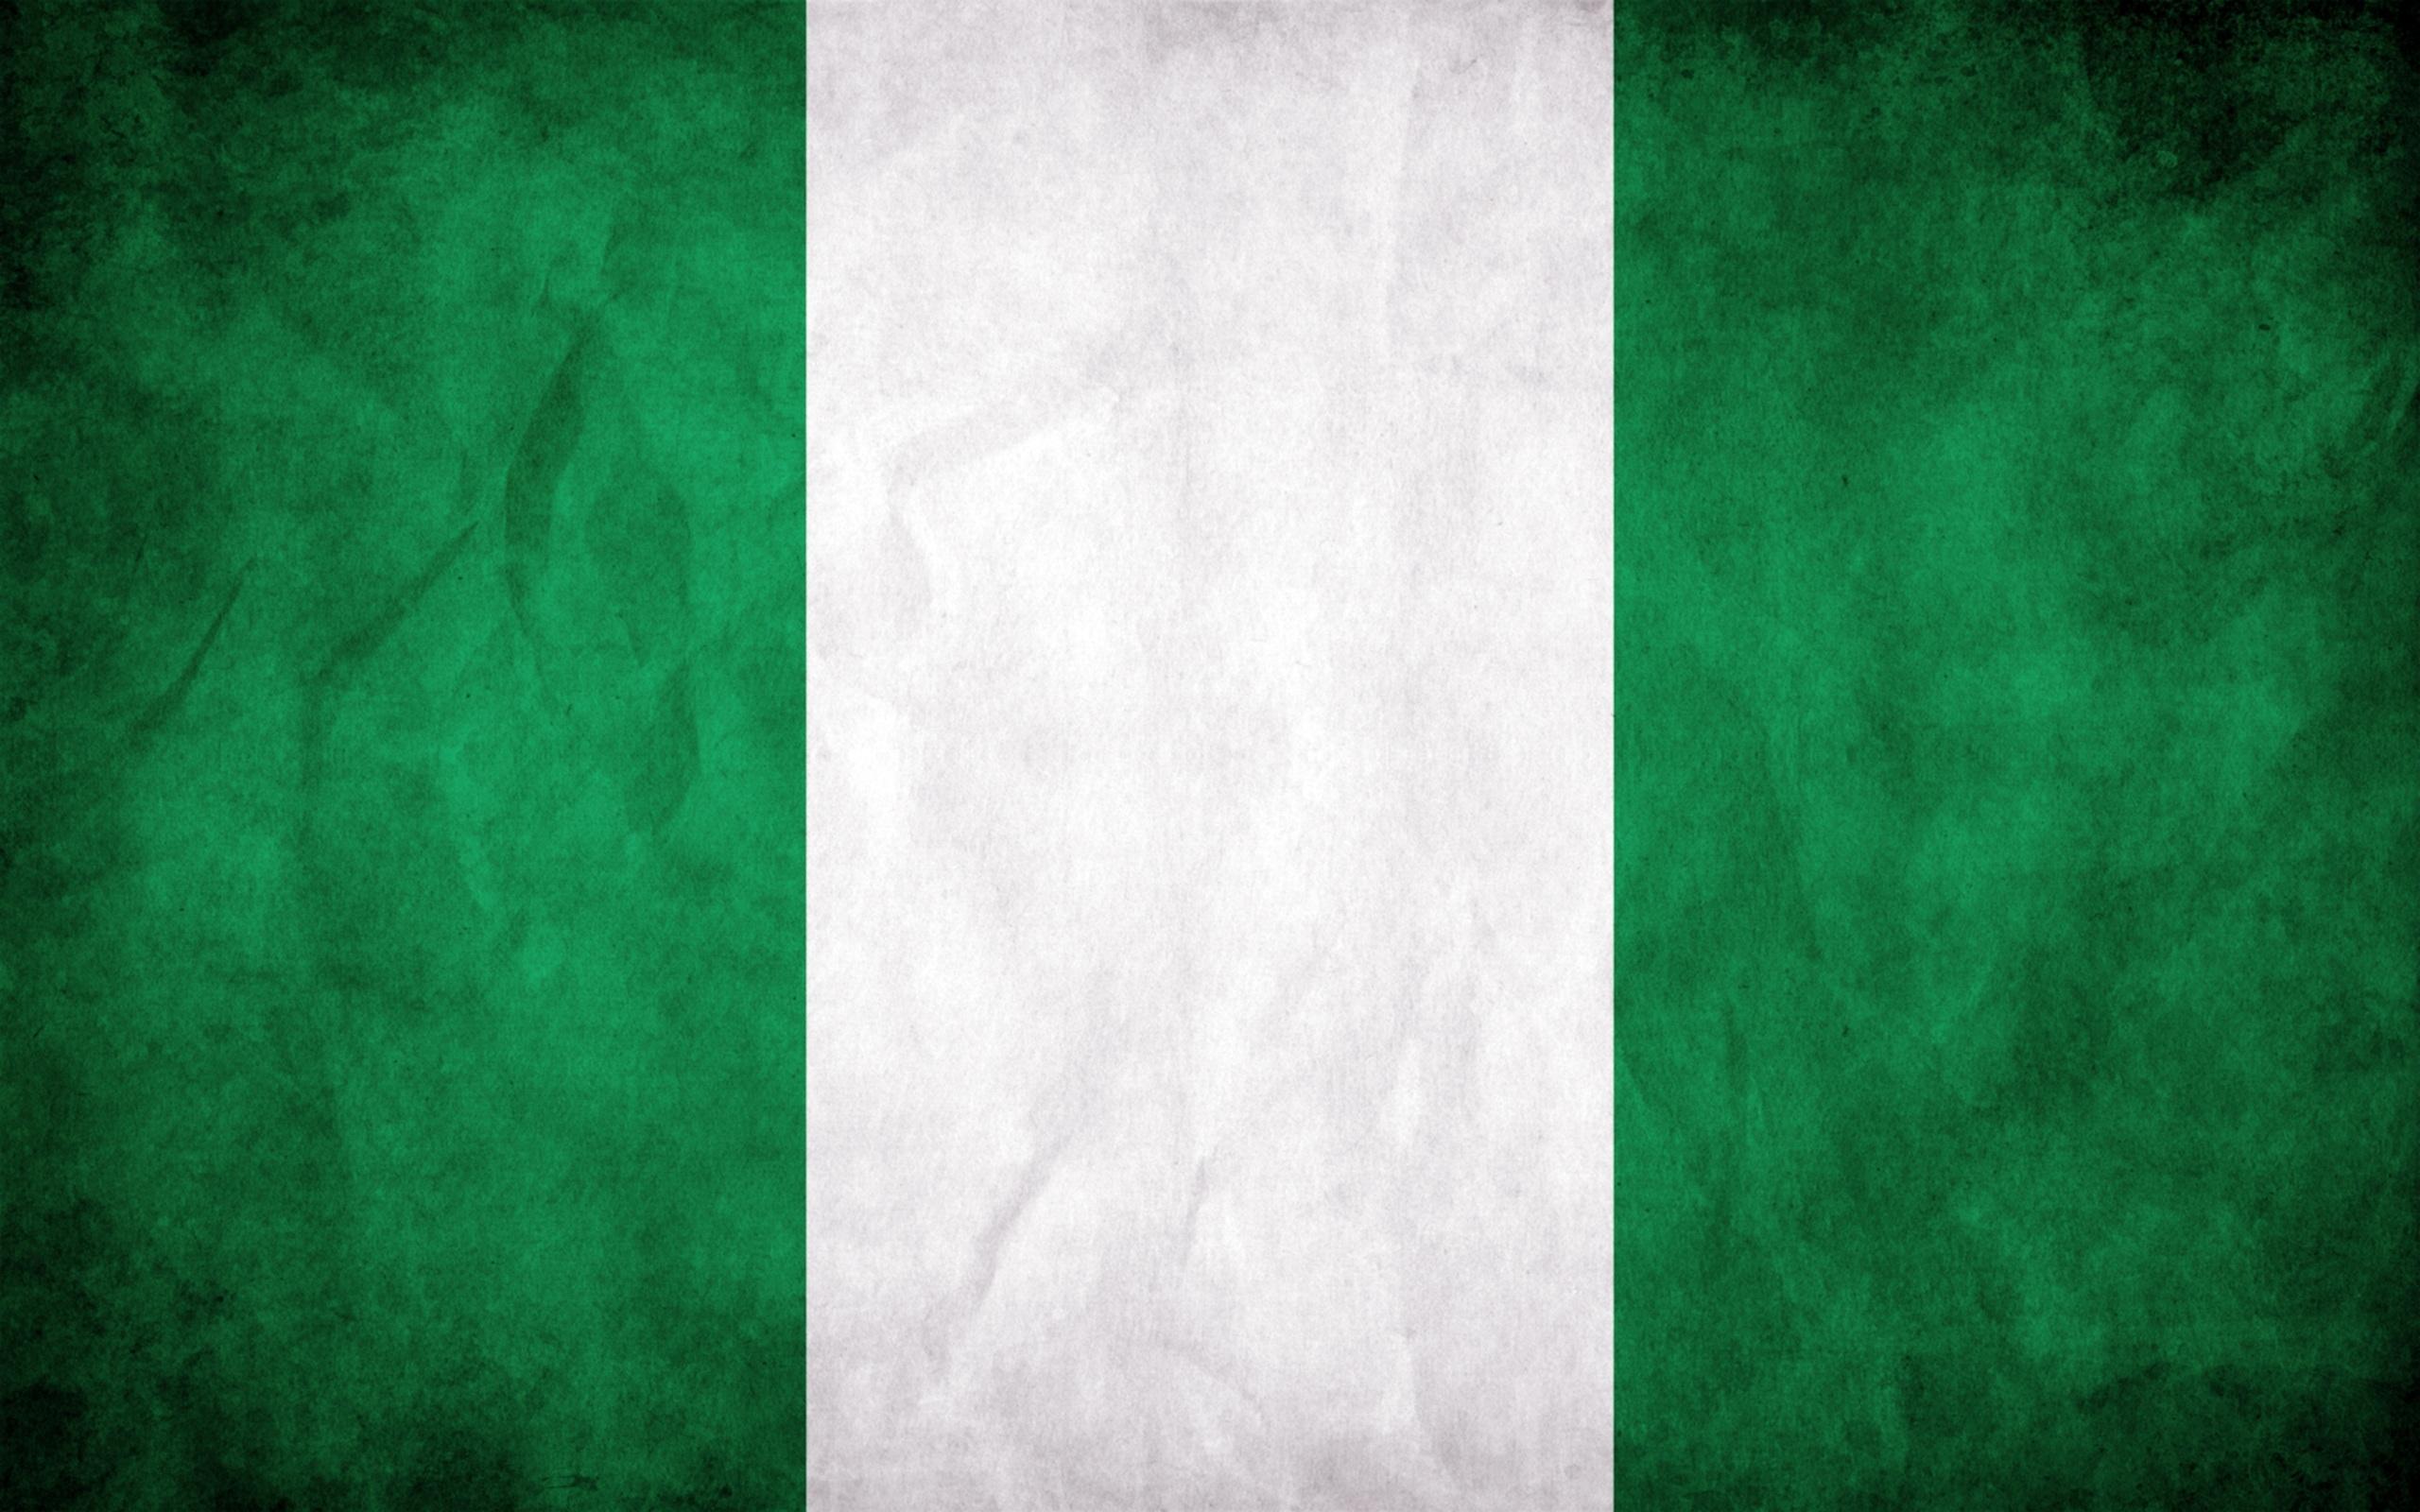 Niger grunge flag photo